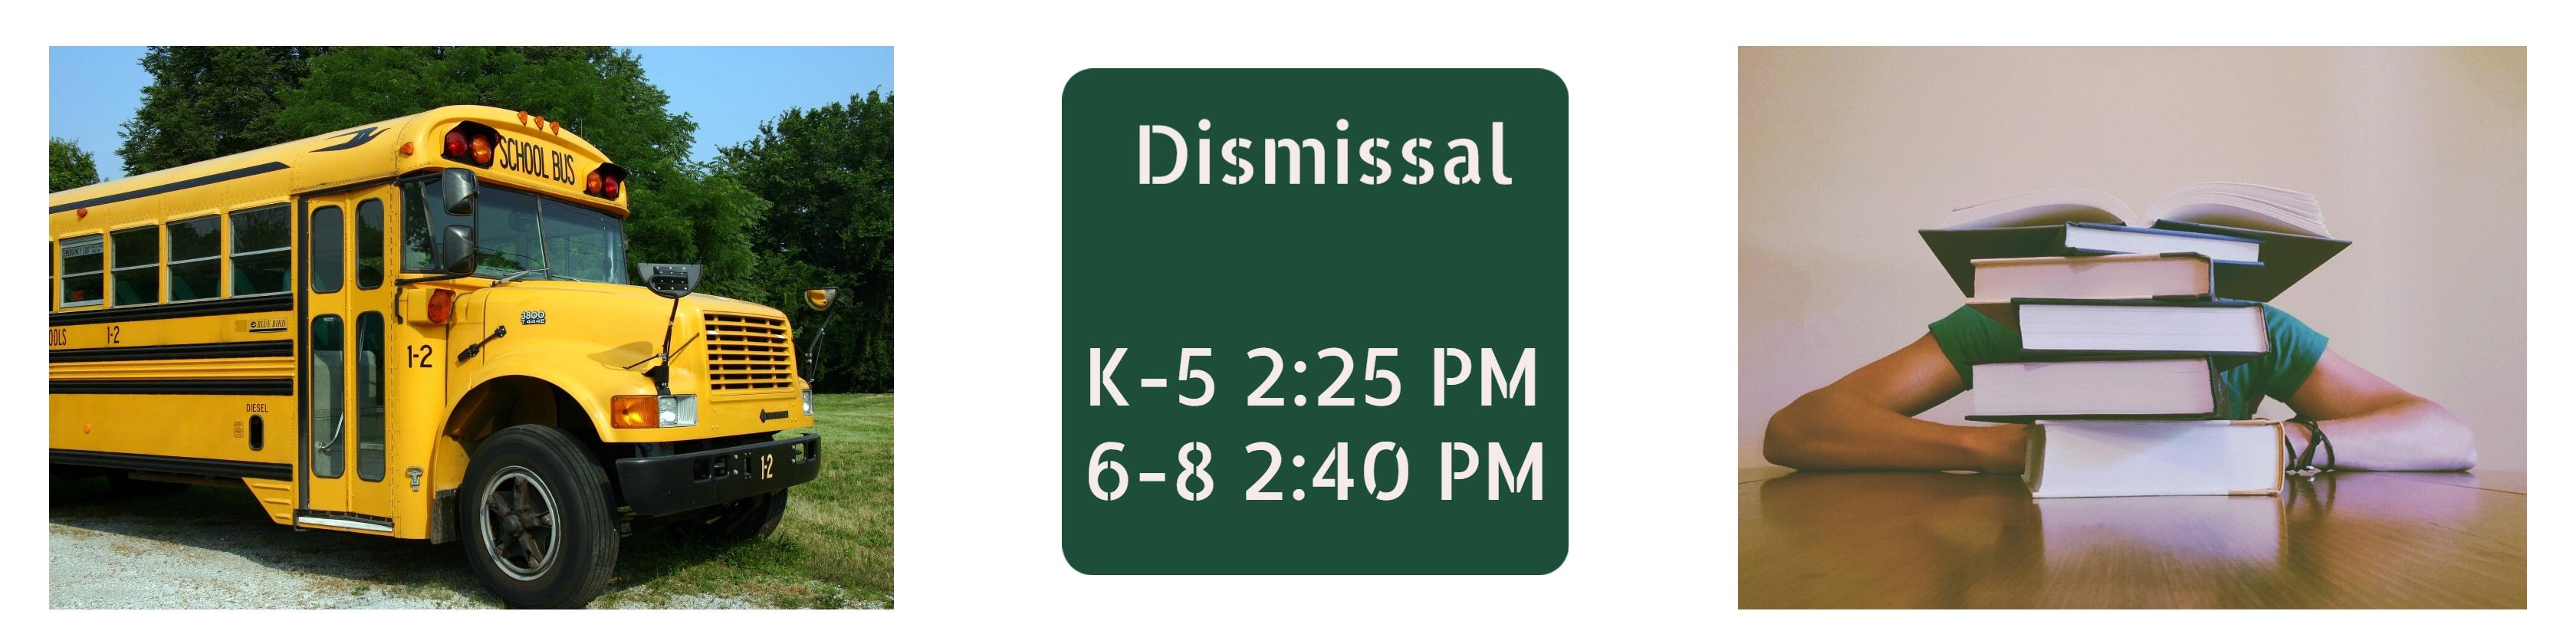 Dismissal Heading